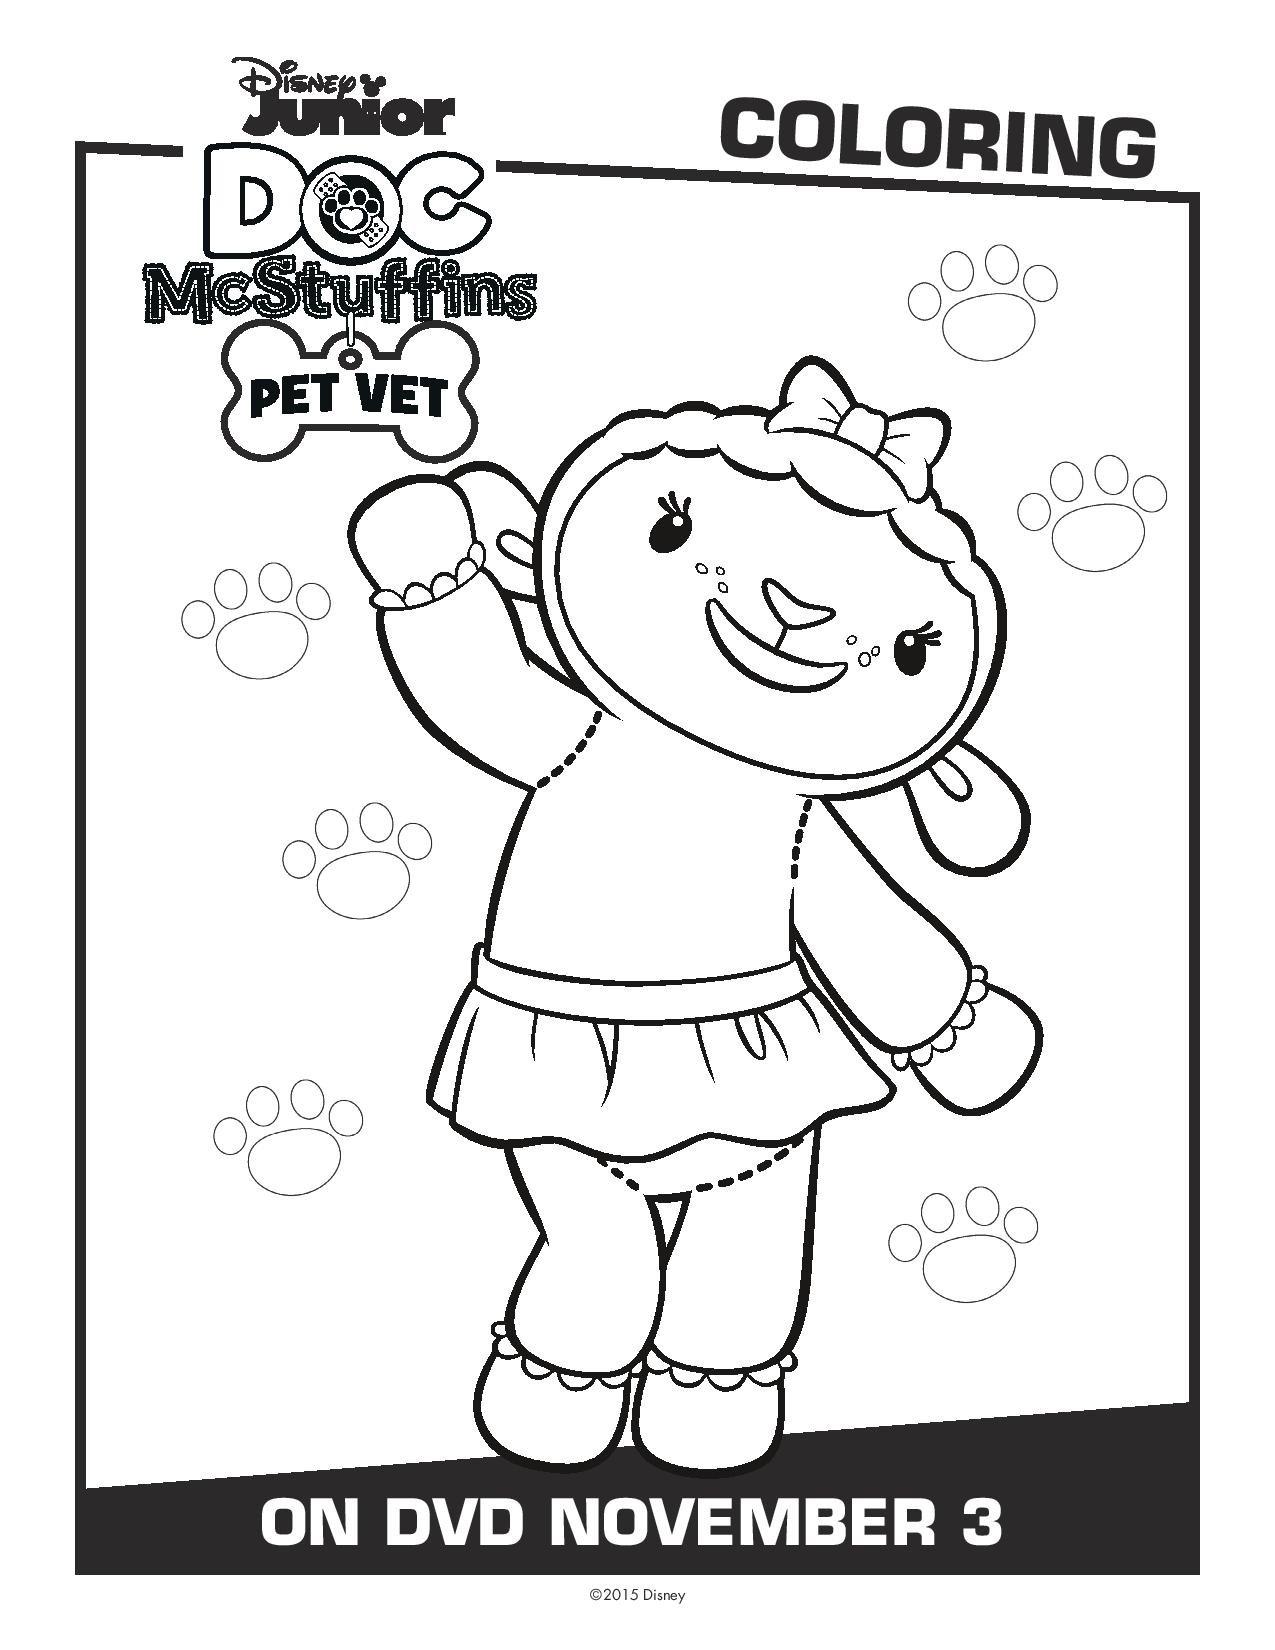 Printable coloring pages doc mcstuffins - Doc Mcstuffins Pet Vet Printable Activity Sheets Dvd Reader Giveaway